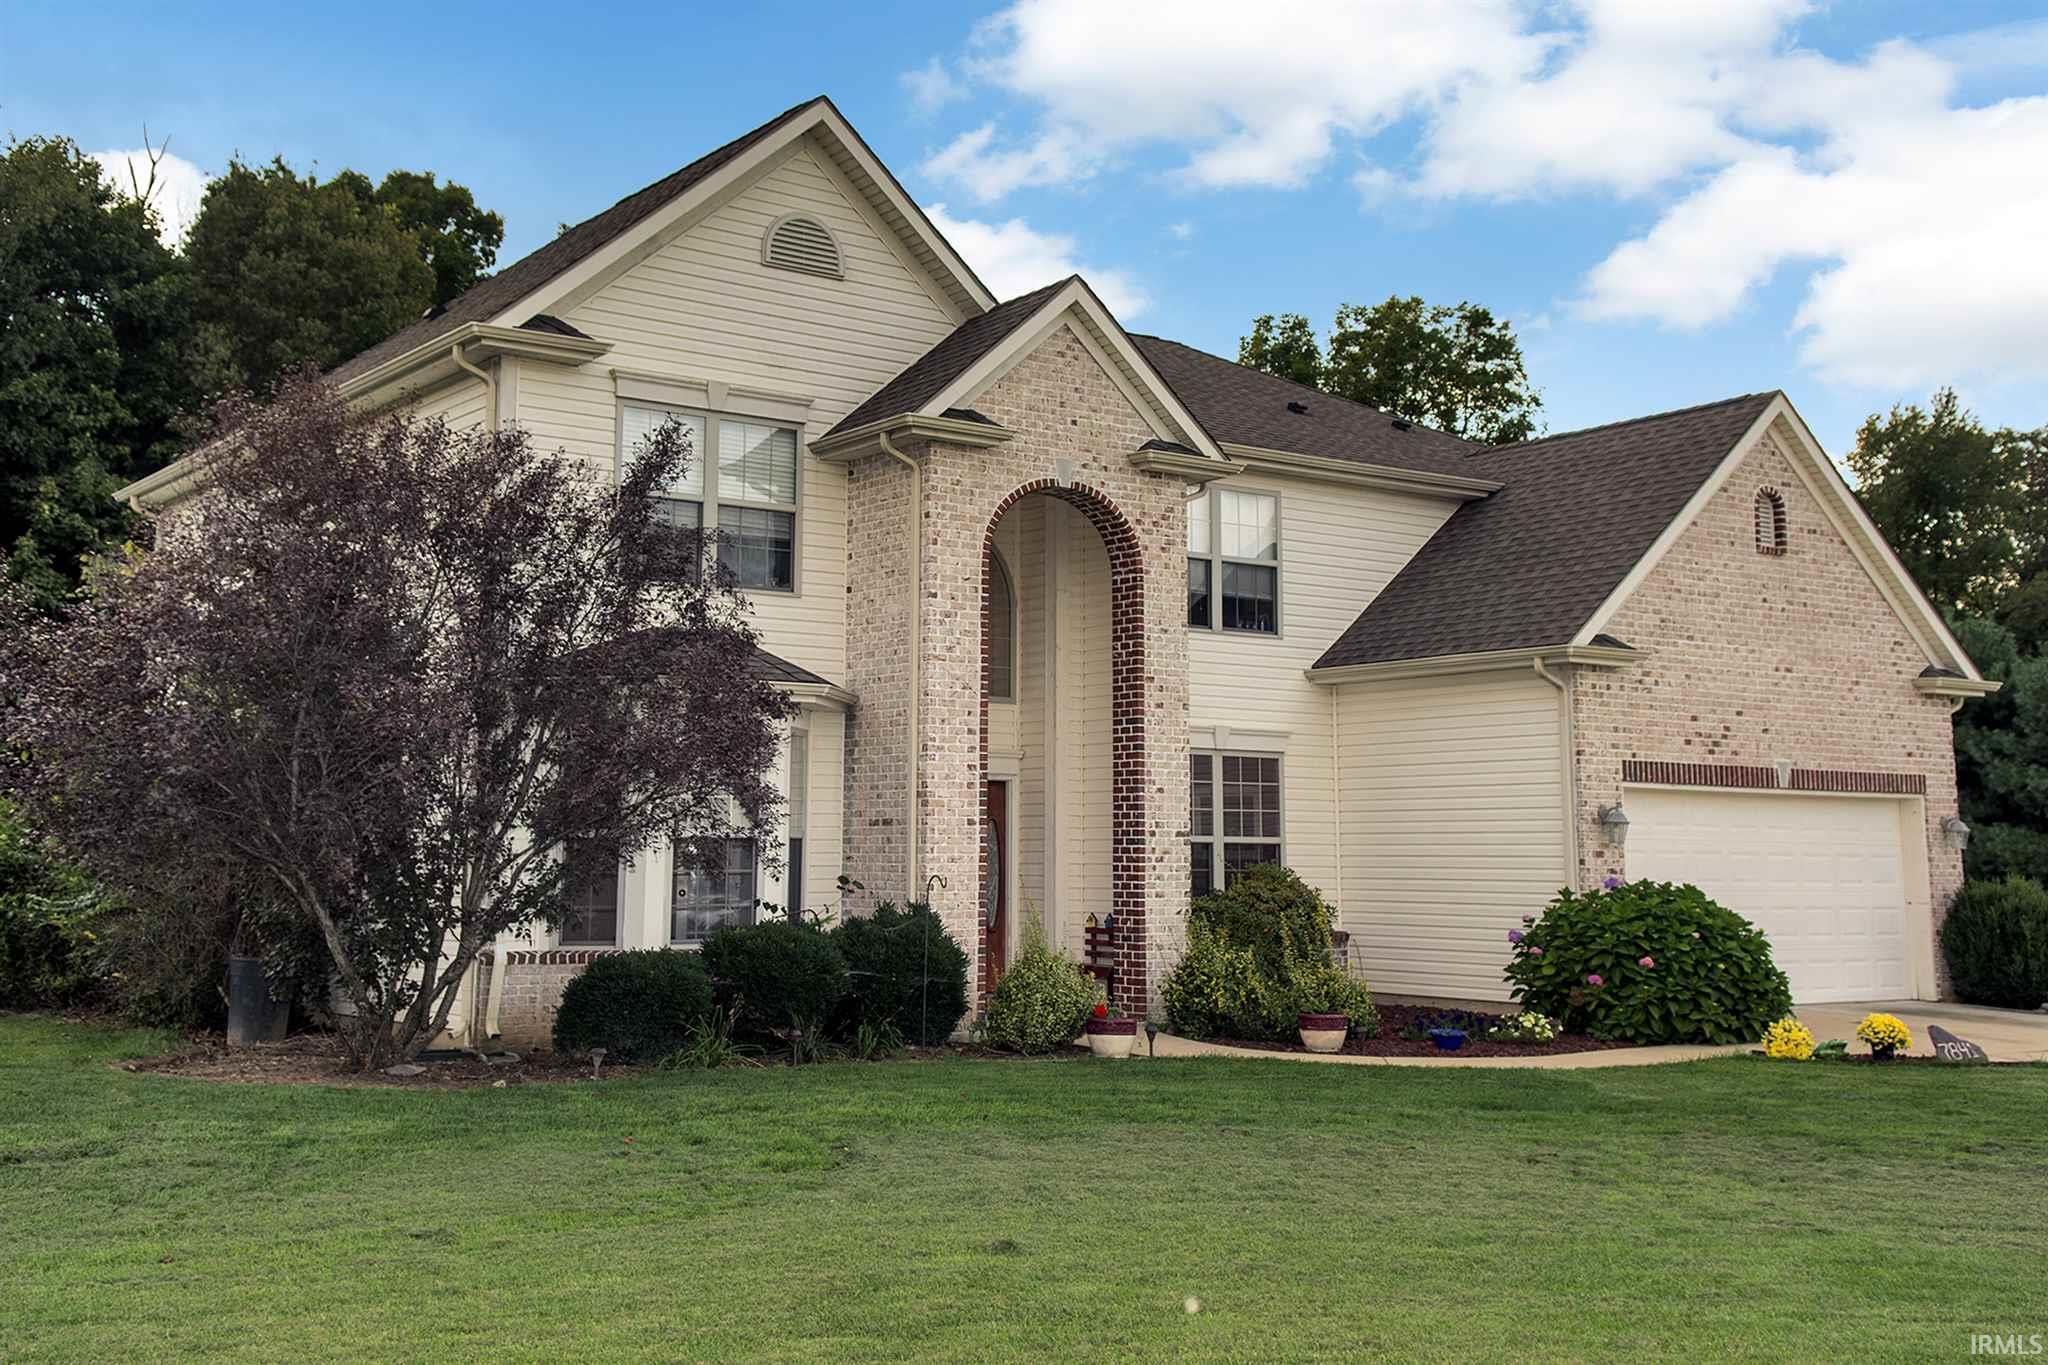 7841 Retriever Lane, Lafayette, IN Single Family Home Property ...